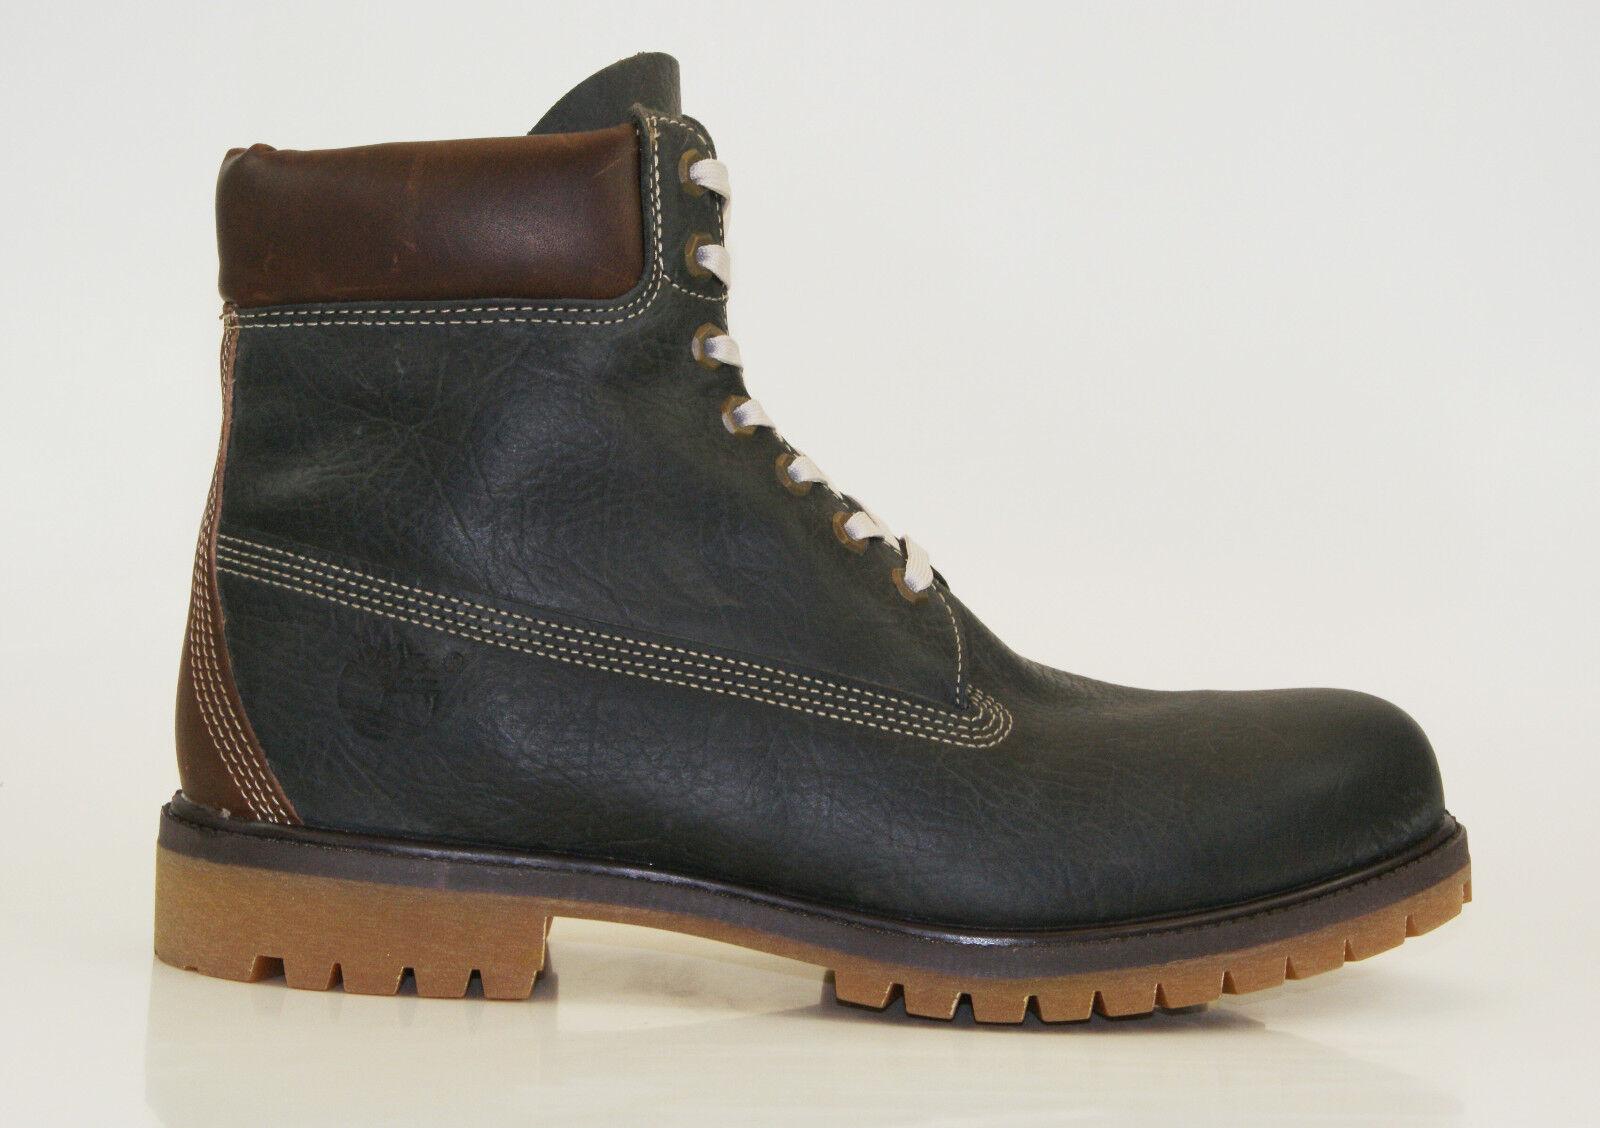 Timberland Joslin Womens Chukka Boots Lace Up Shoes Wheat Leather A13HW B90E